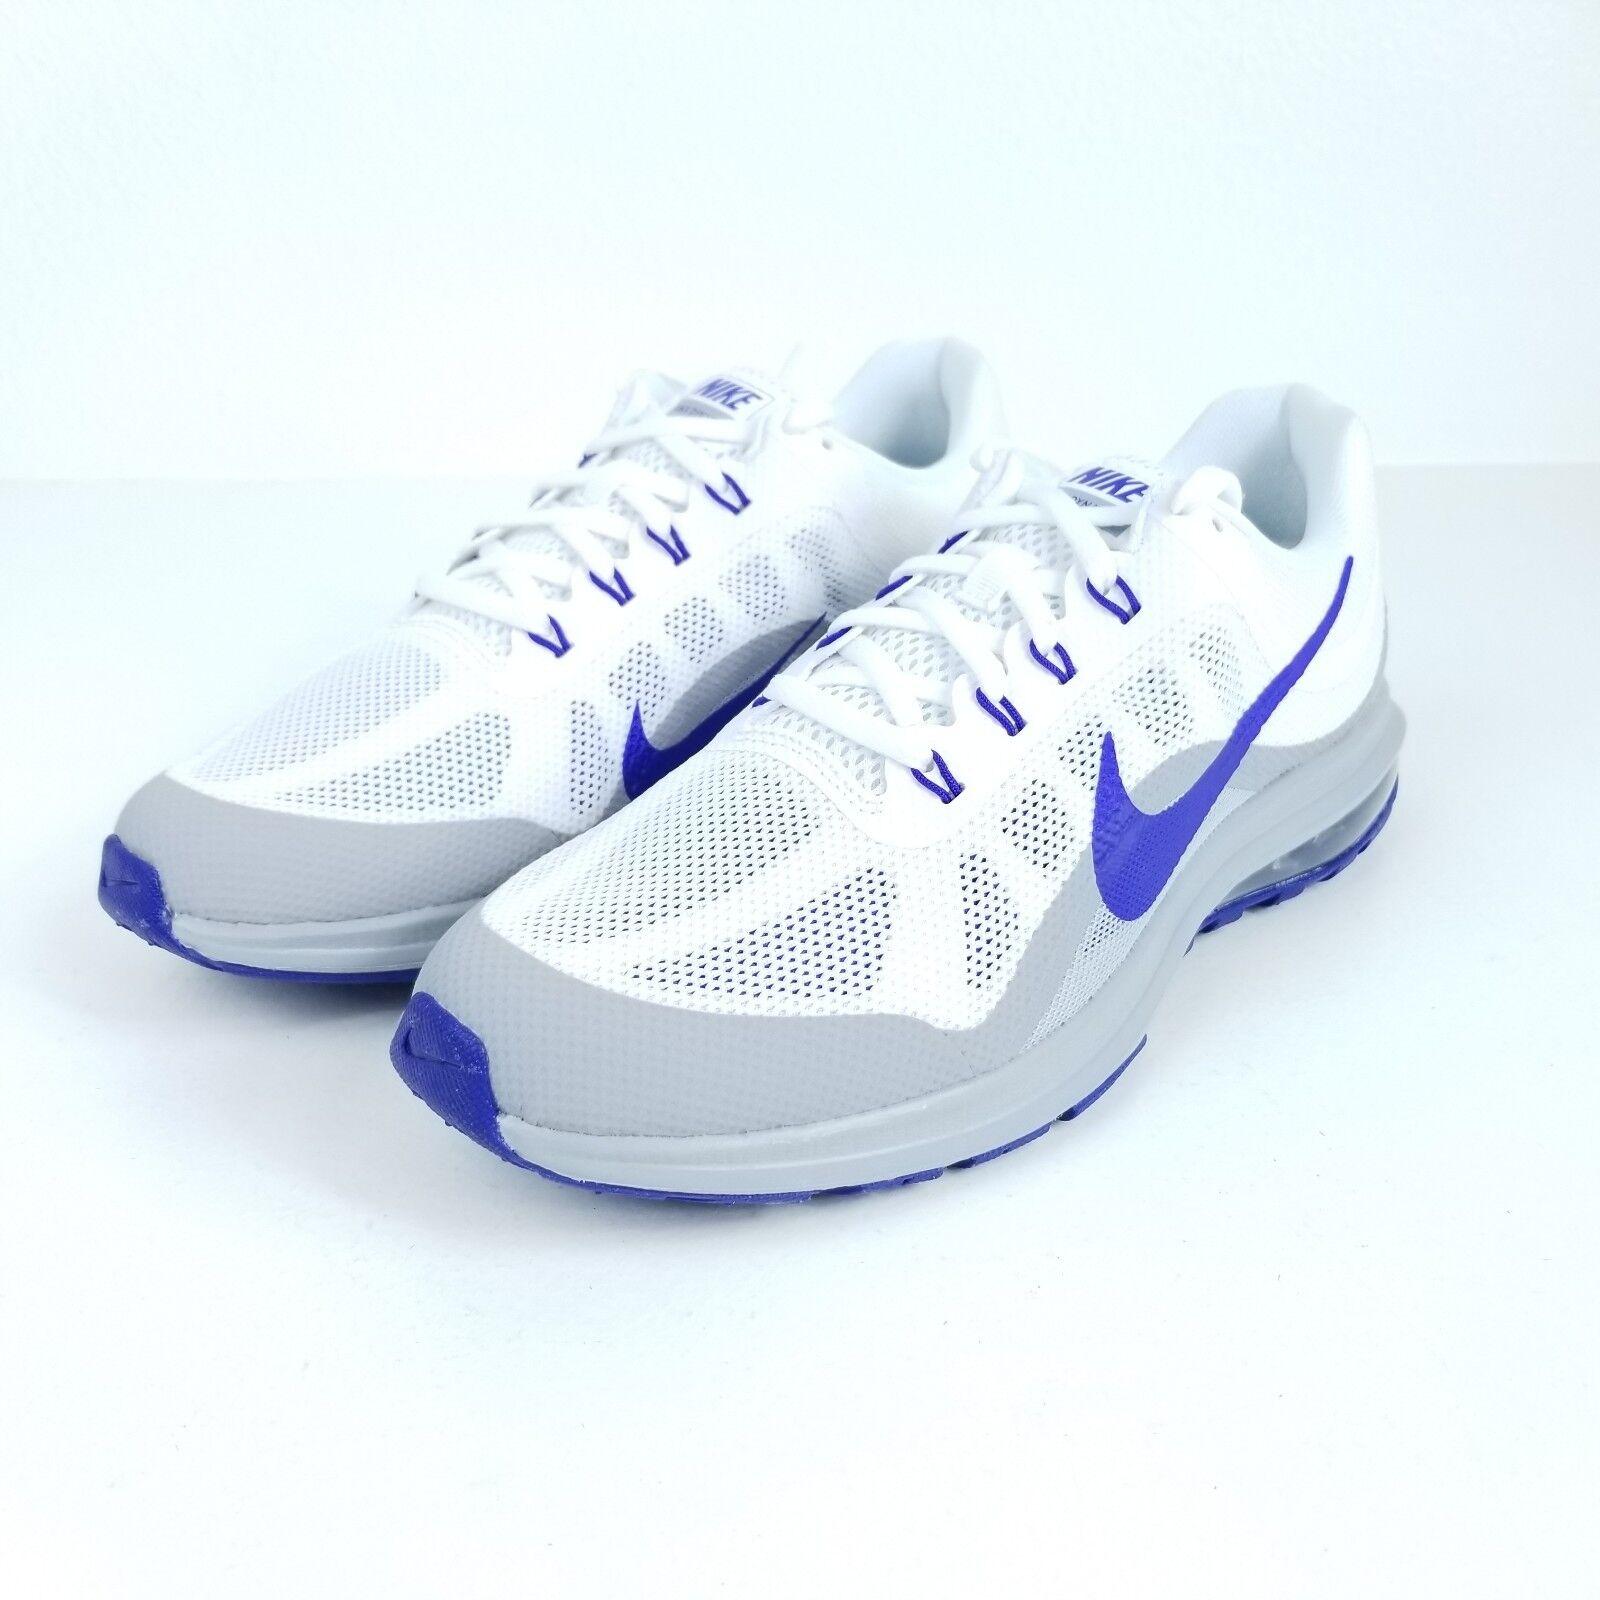 NIKE Air Max Dynasty 2 Mens Sz 10 Shoes Blue White 852430 104